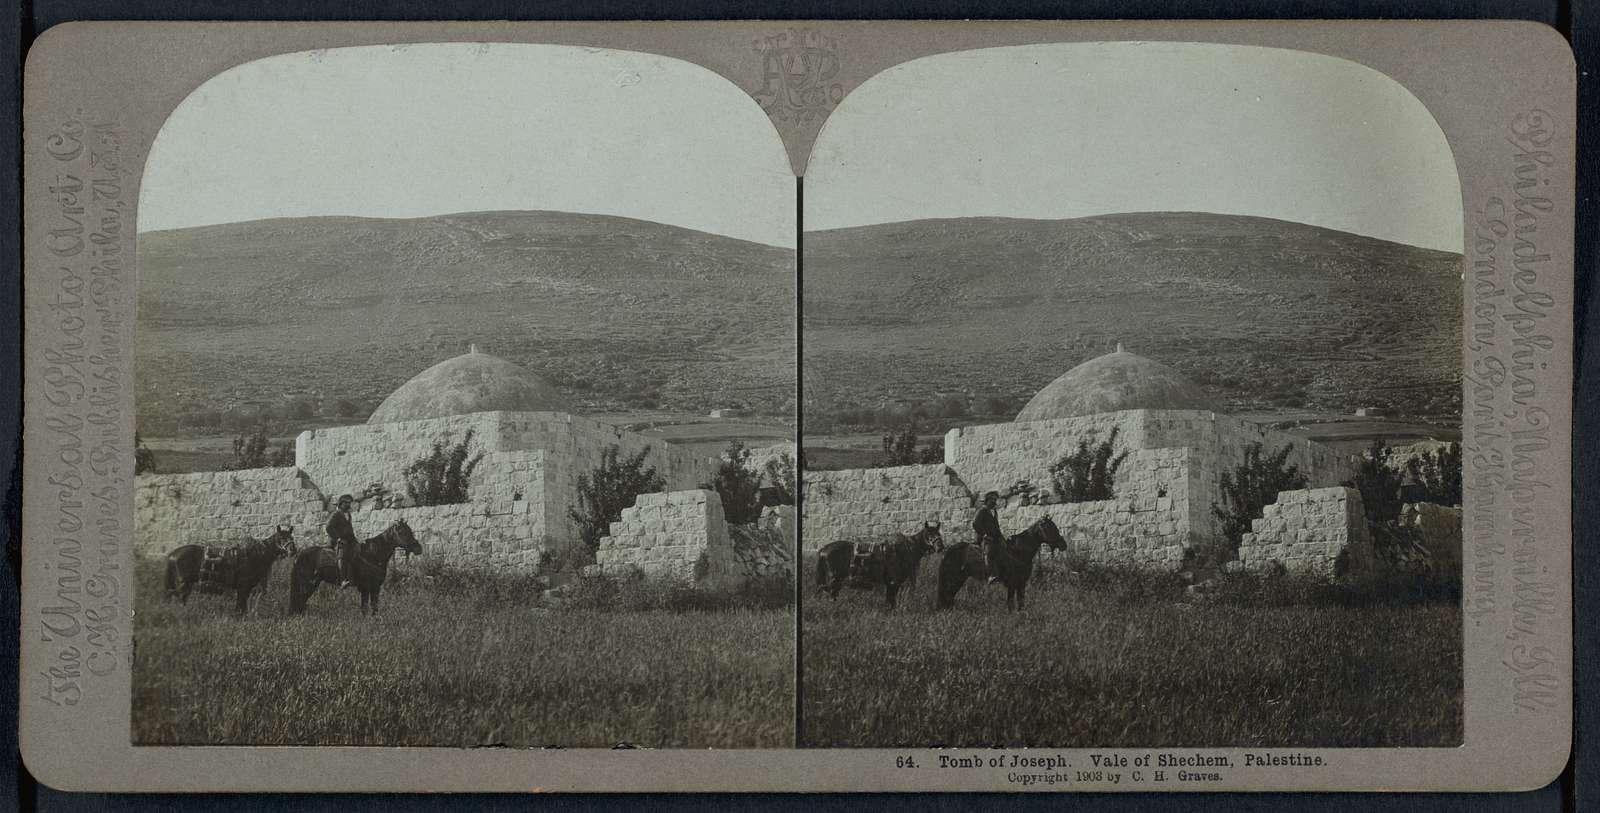 Tomb of Joseph. Vale of Shechem, Palestine